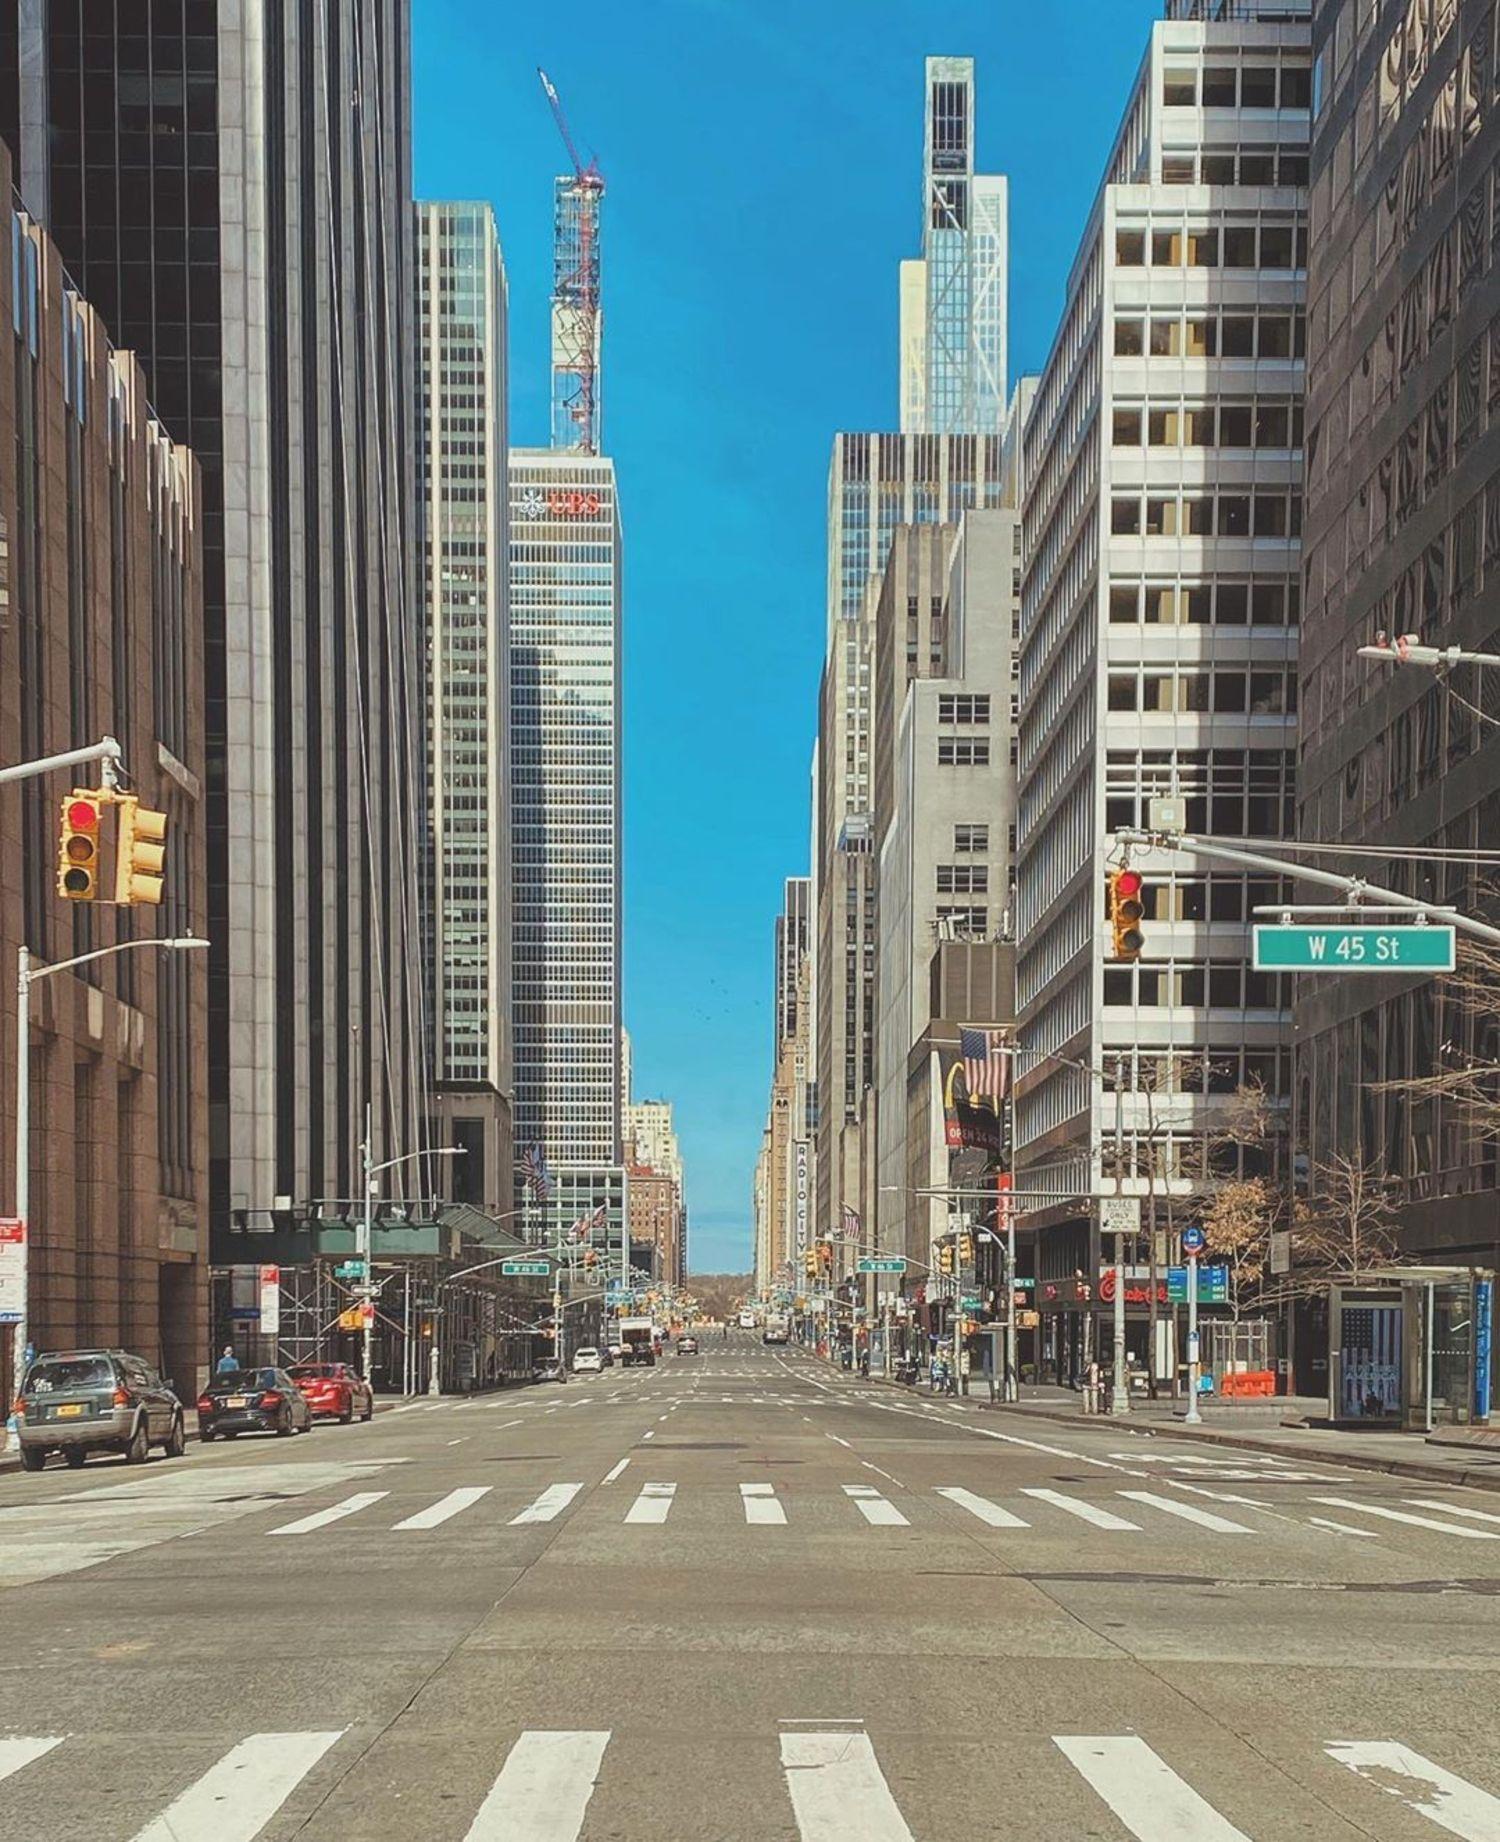 6th Avenue and 45th Street, Midtown, Manhattan